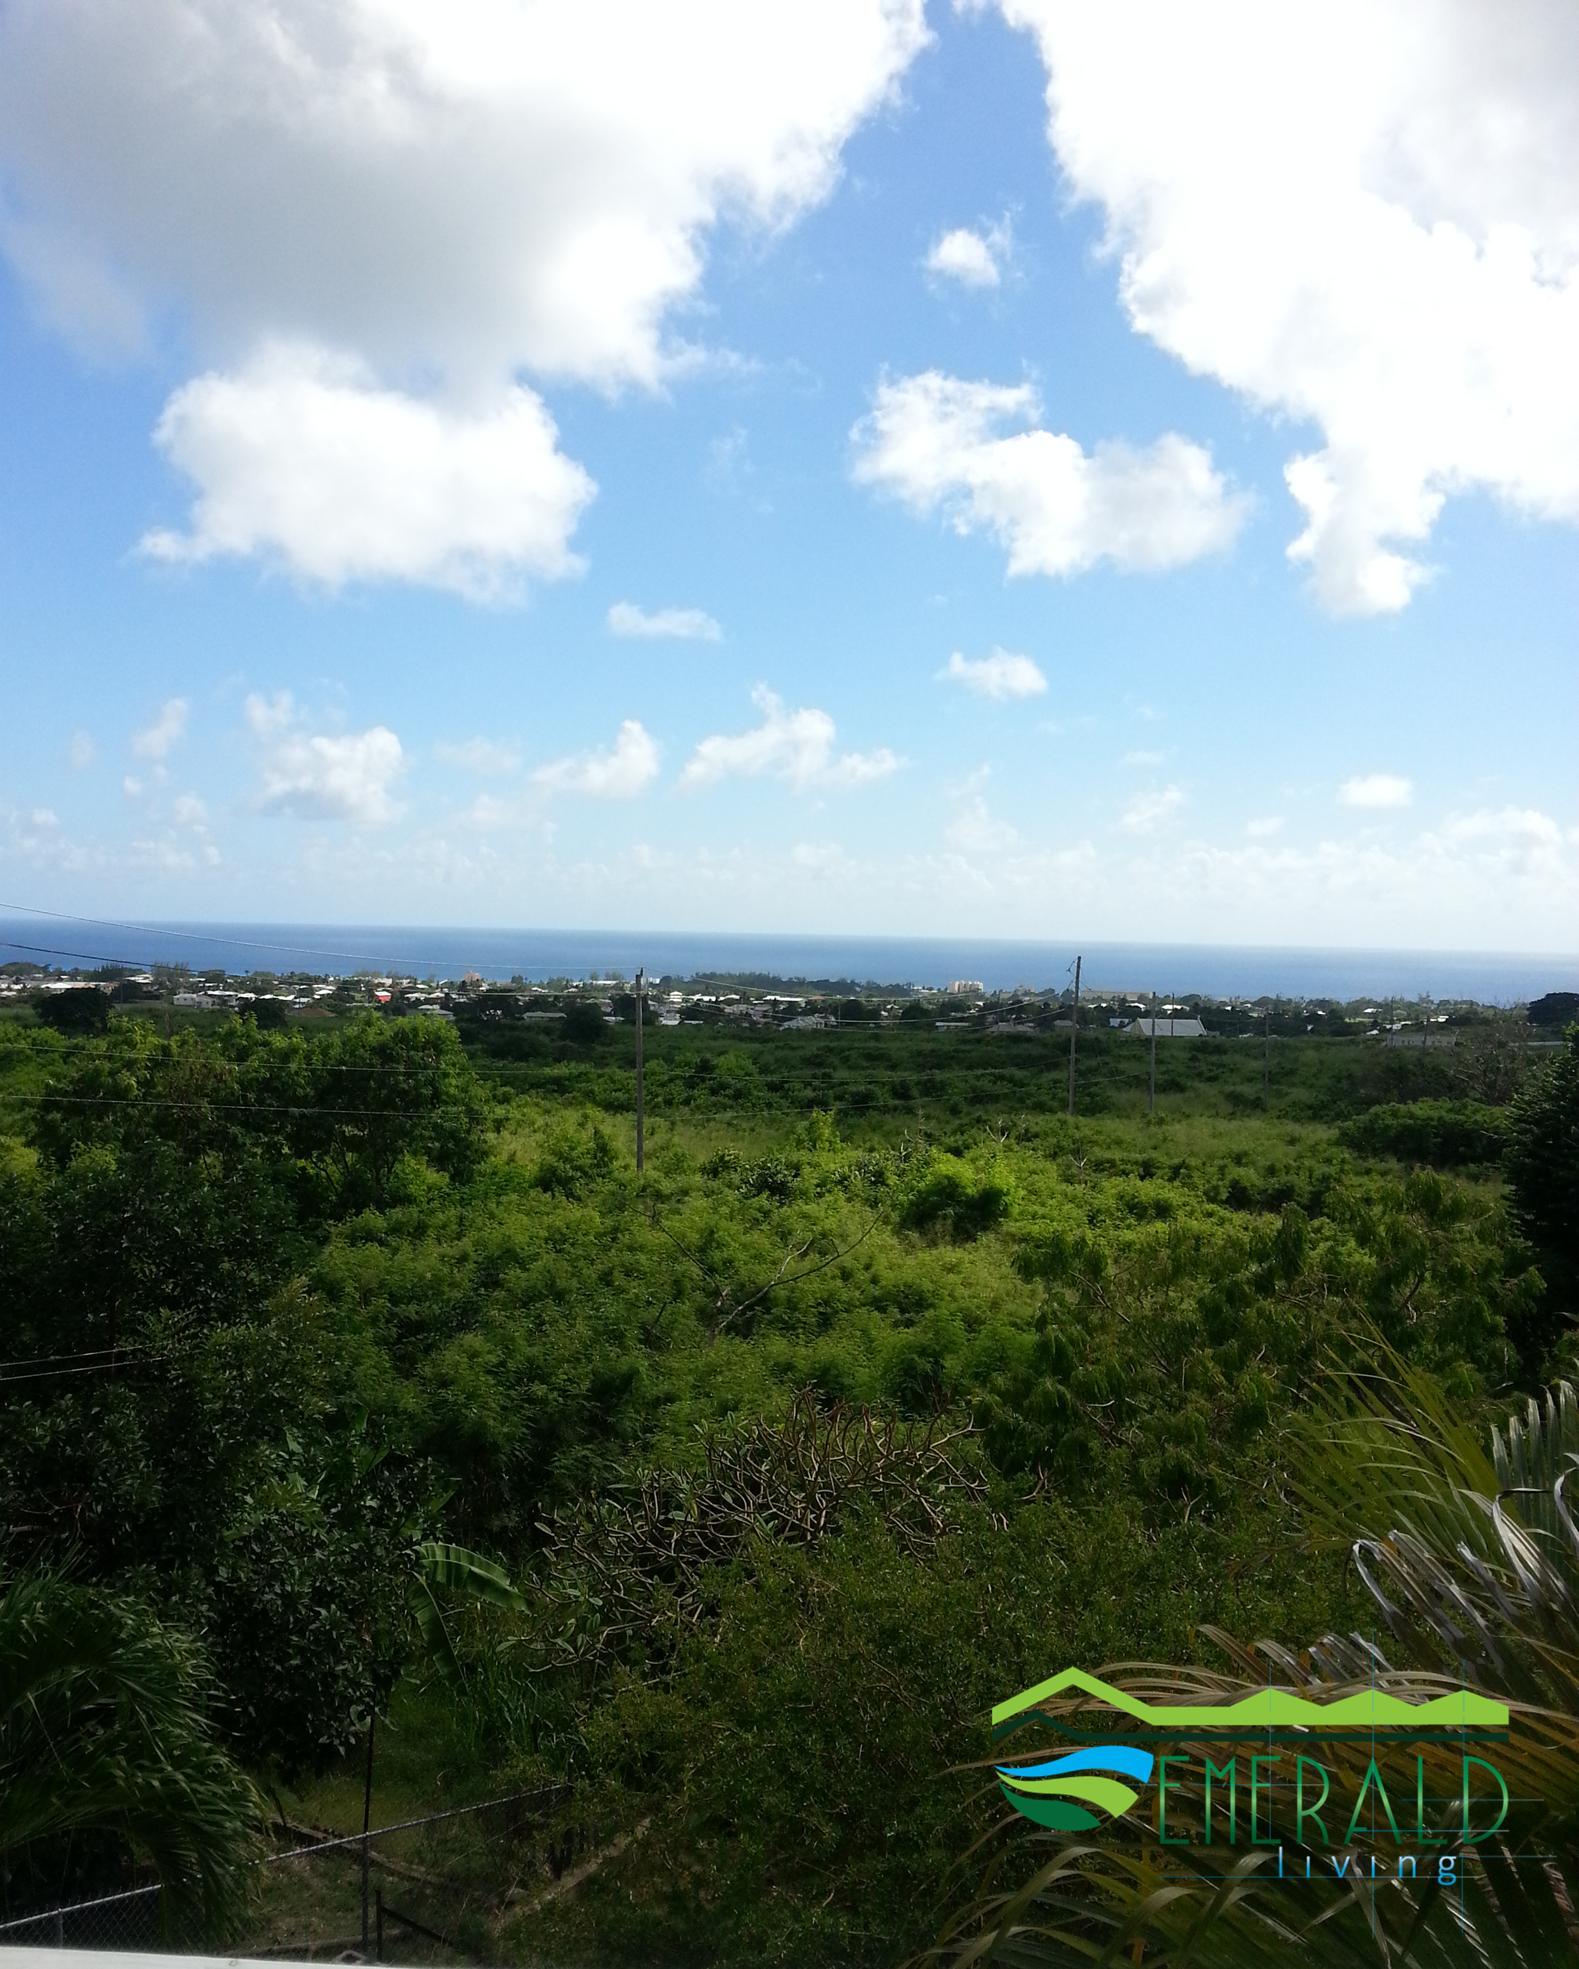 Emerald Living Barbados Real Estate